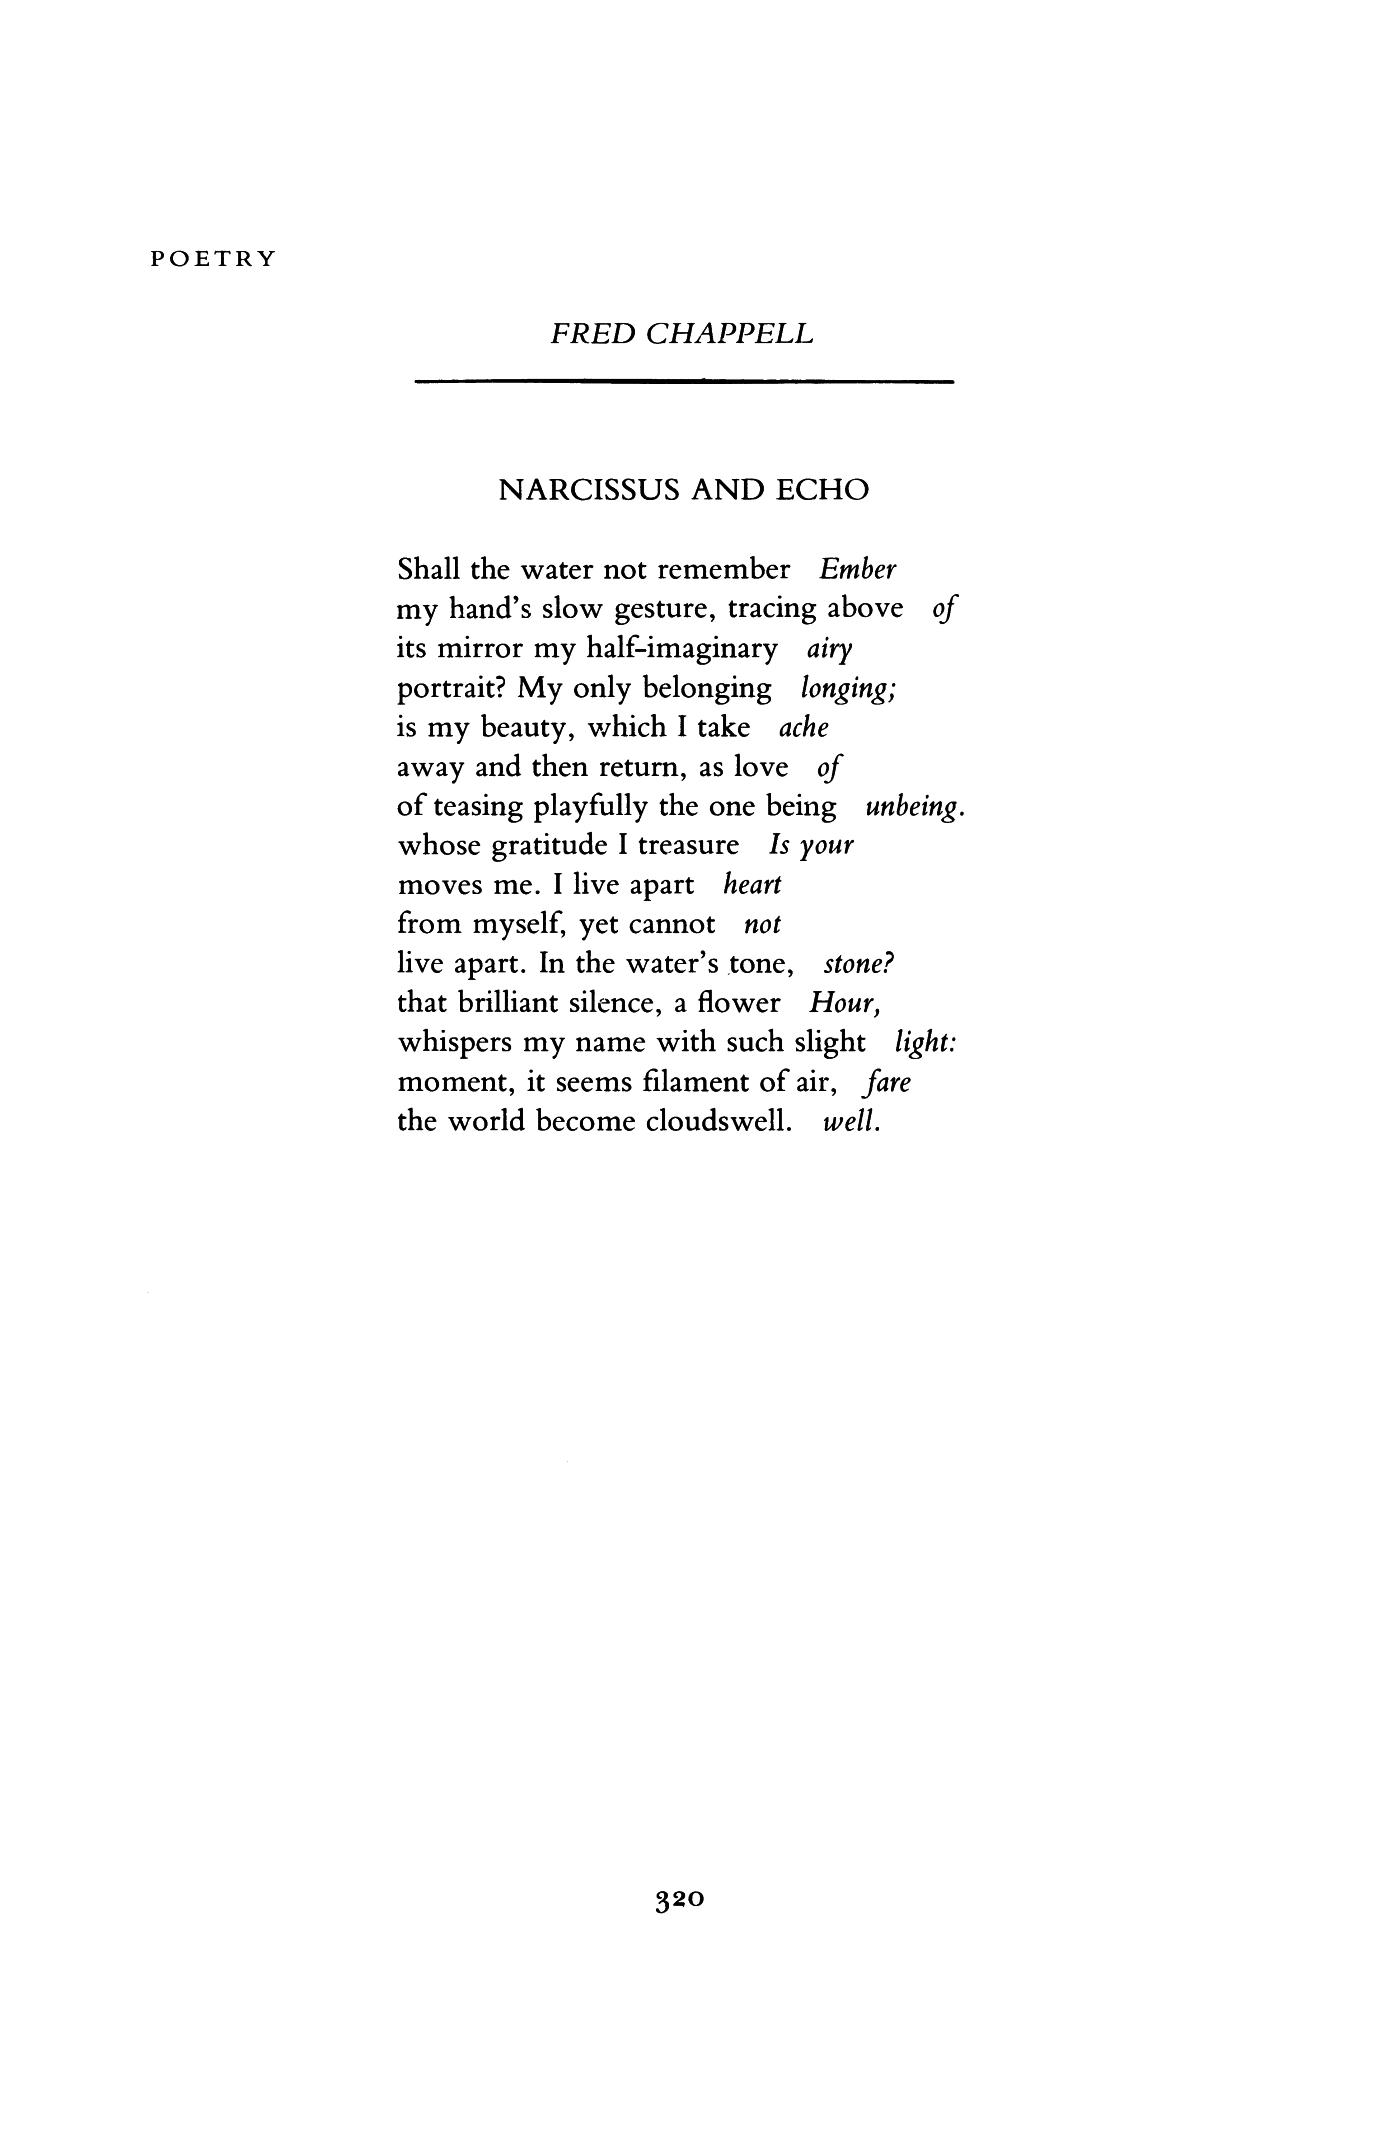 echo poem analysis